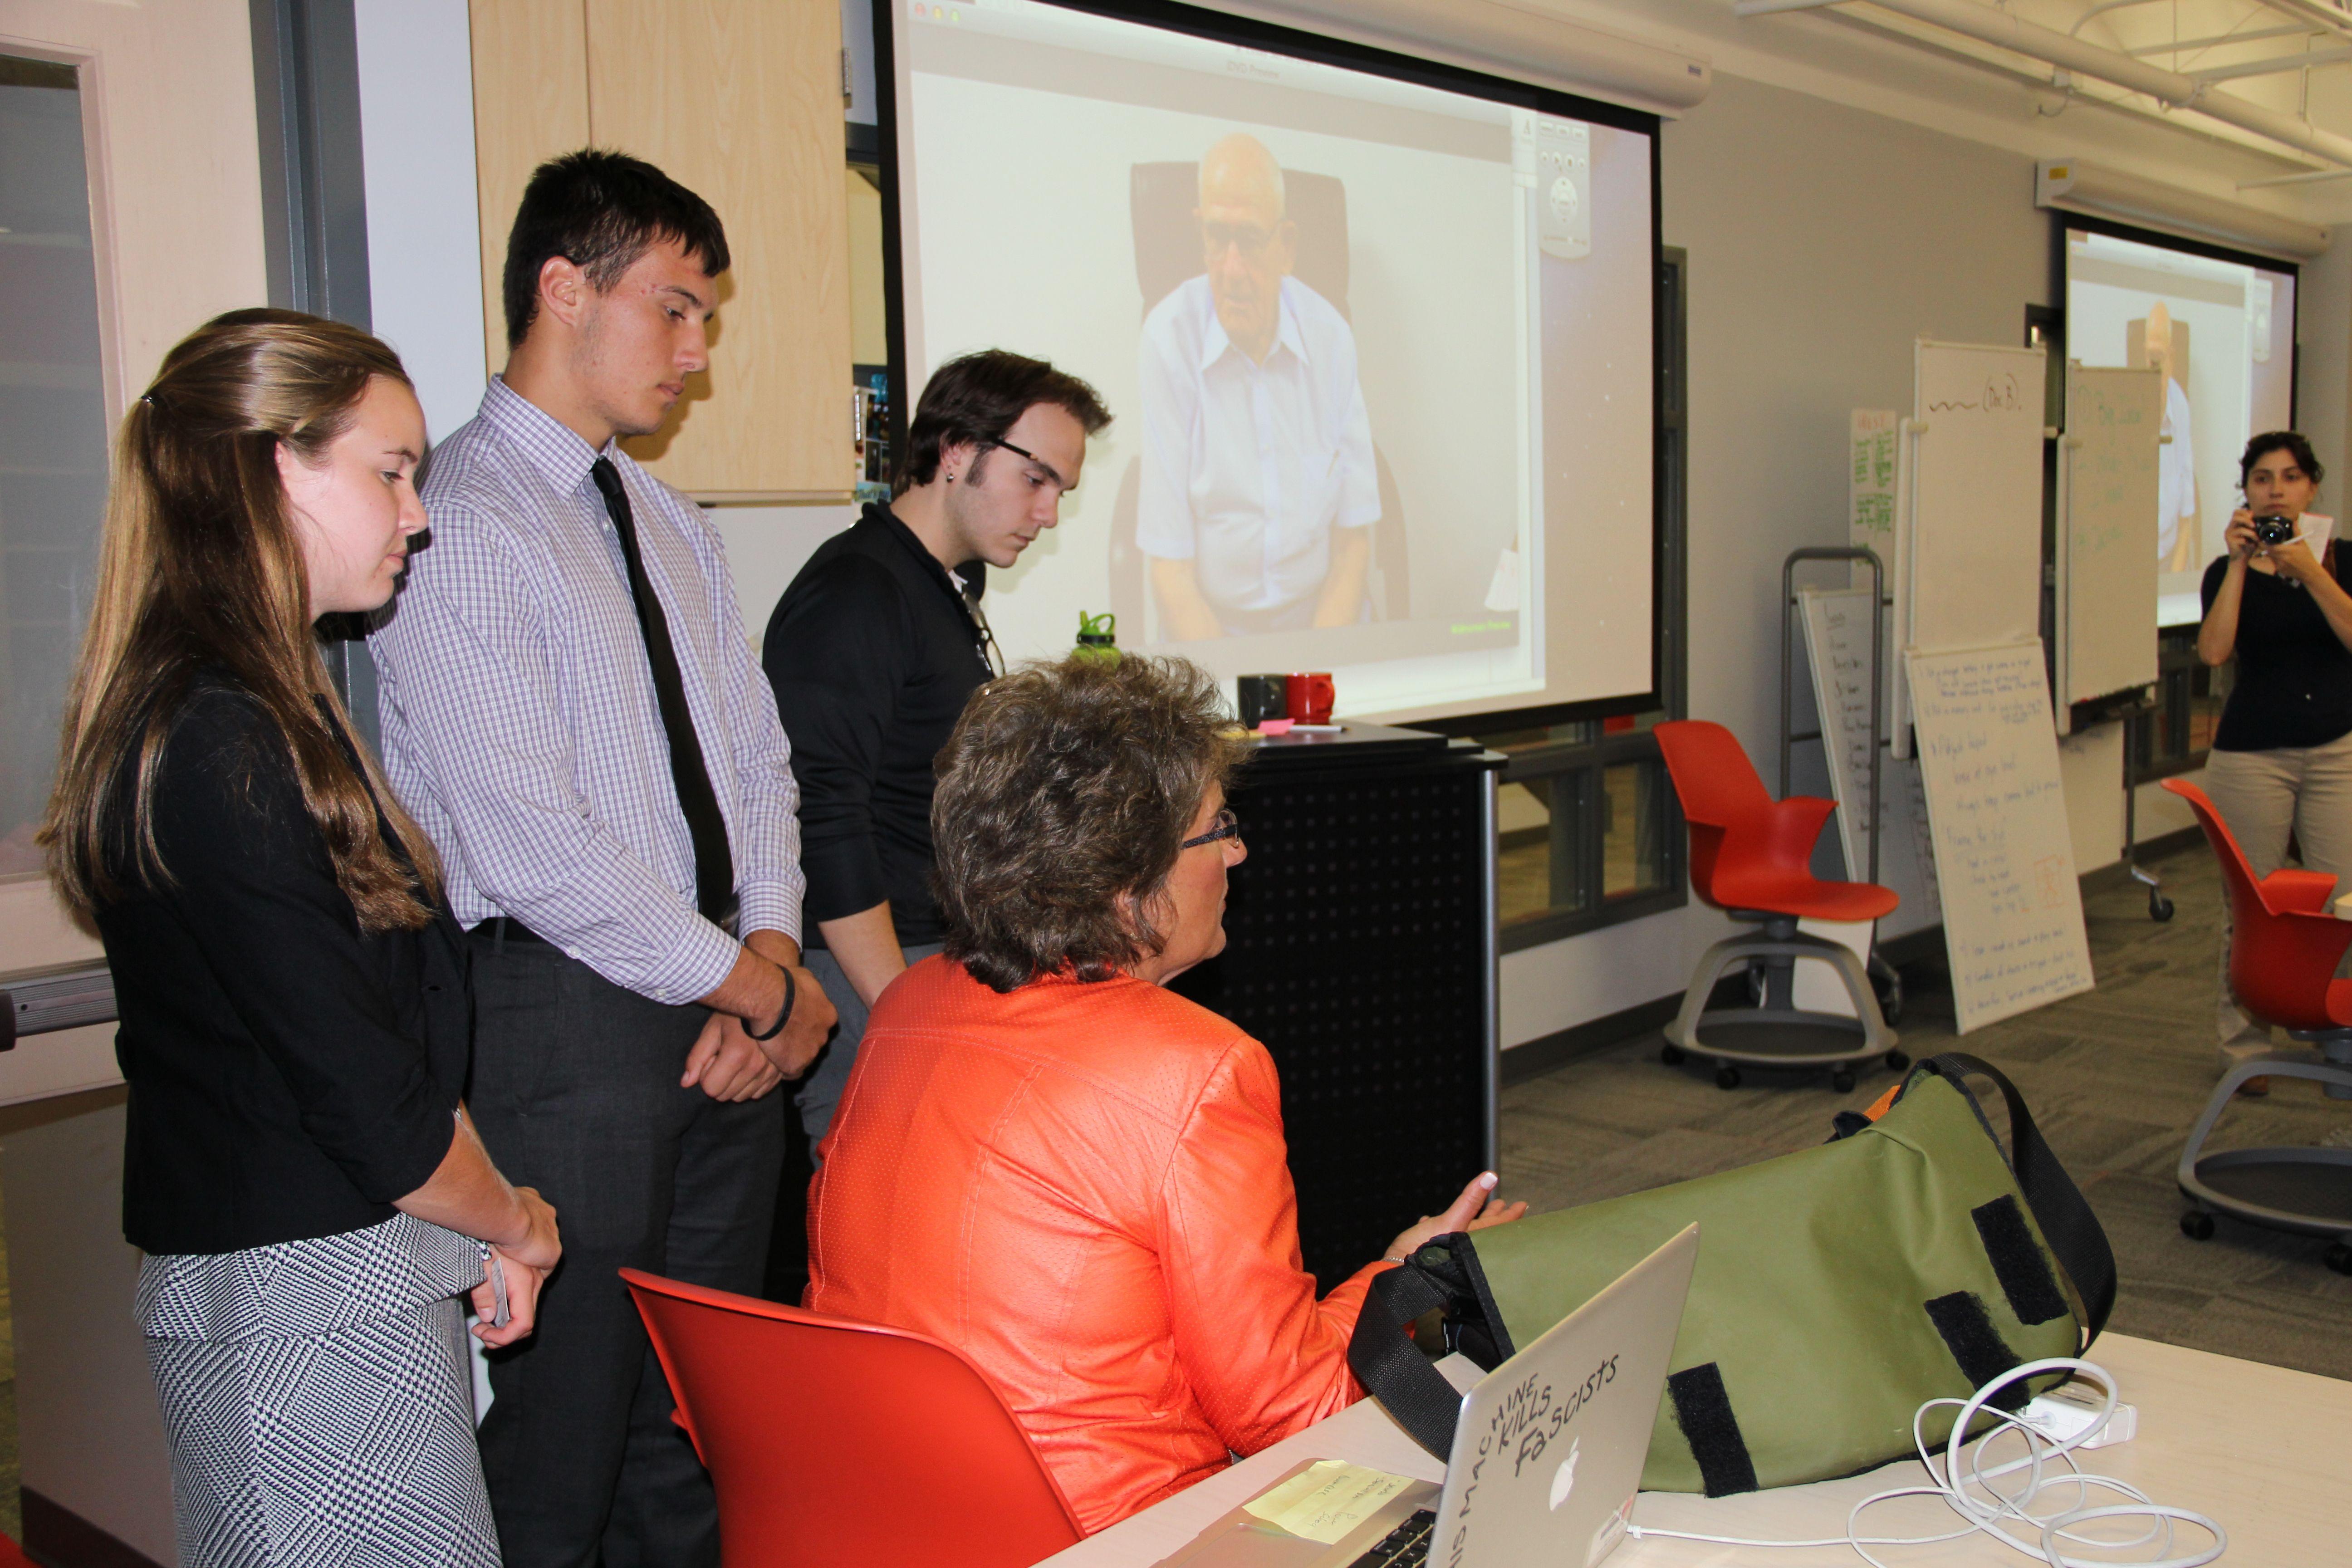 U.S. Rep. Jackie Walorski's Education Tour across the